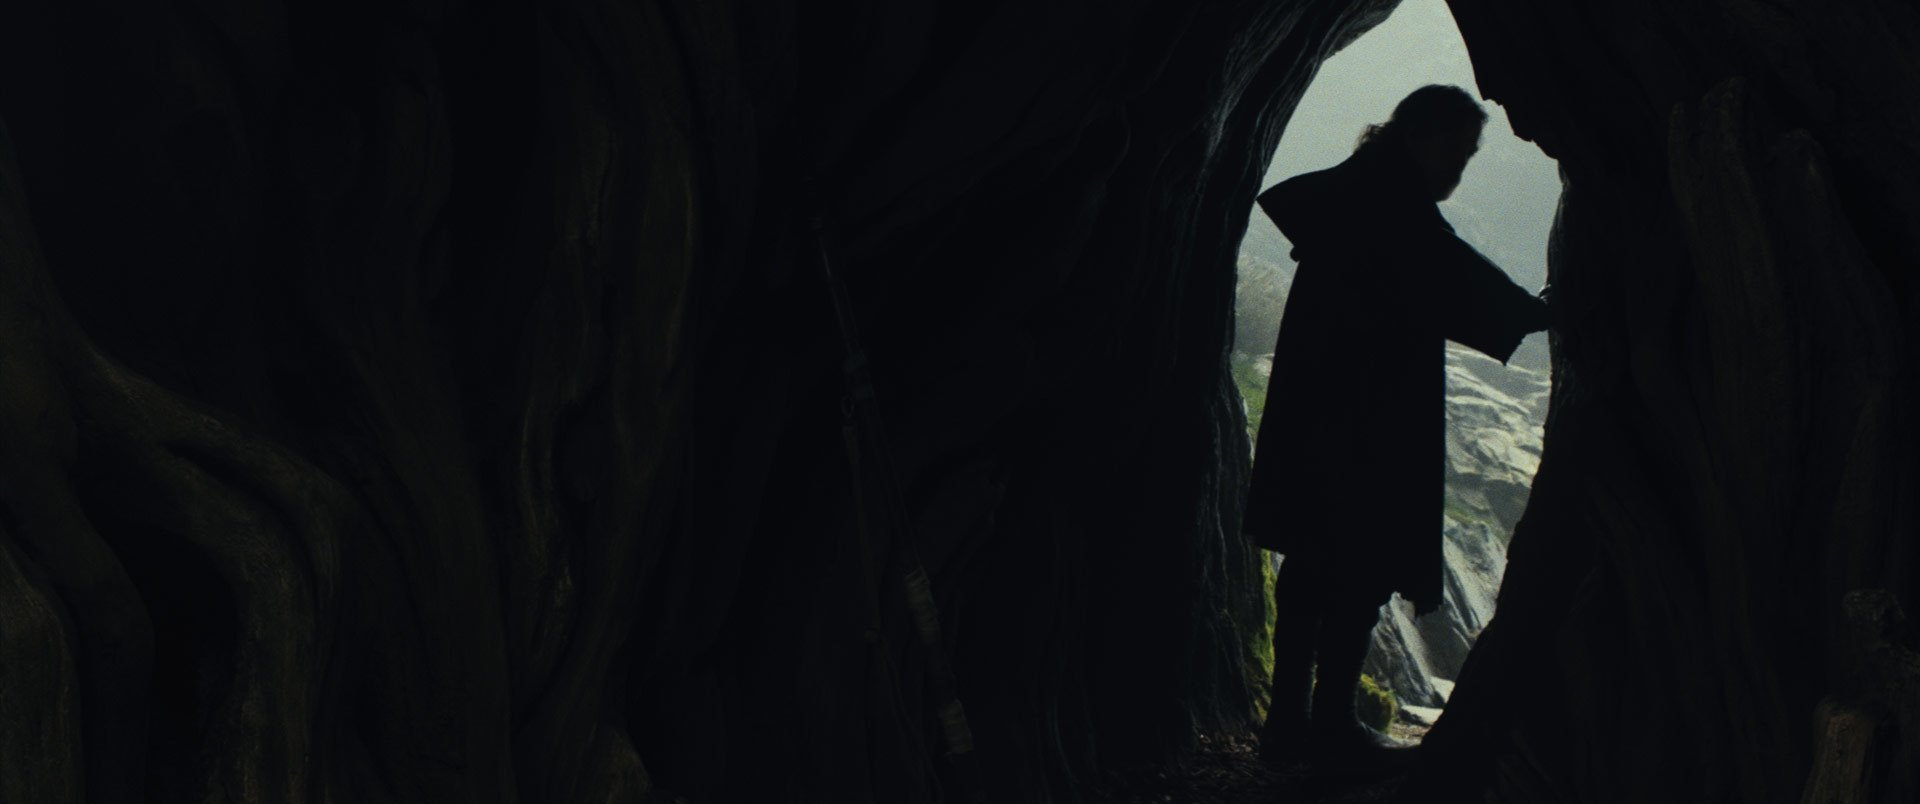 Photo du film Star Wars: Les Derniers Jedi avec la silhouette de Luke